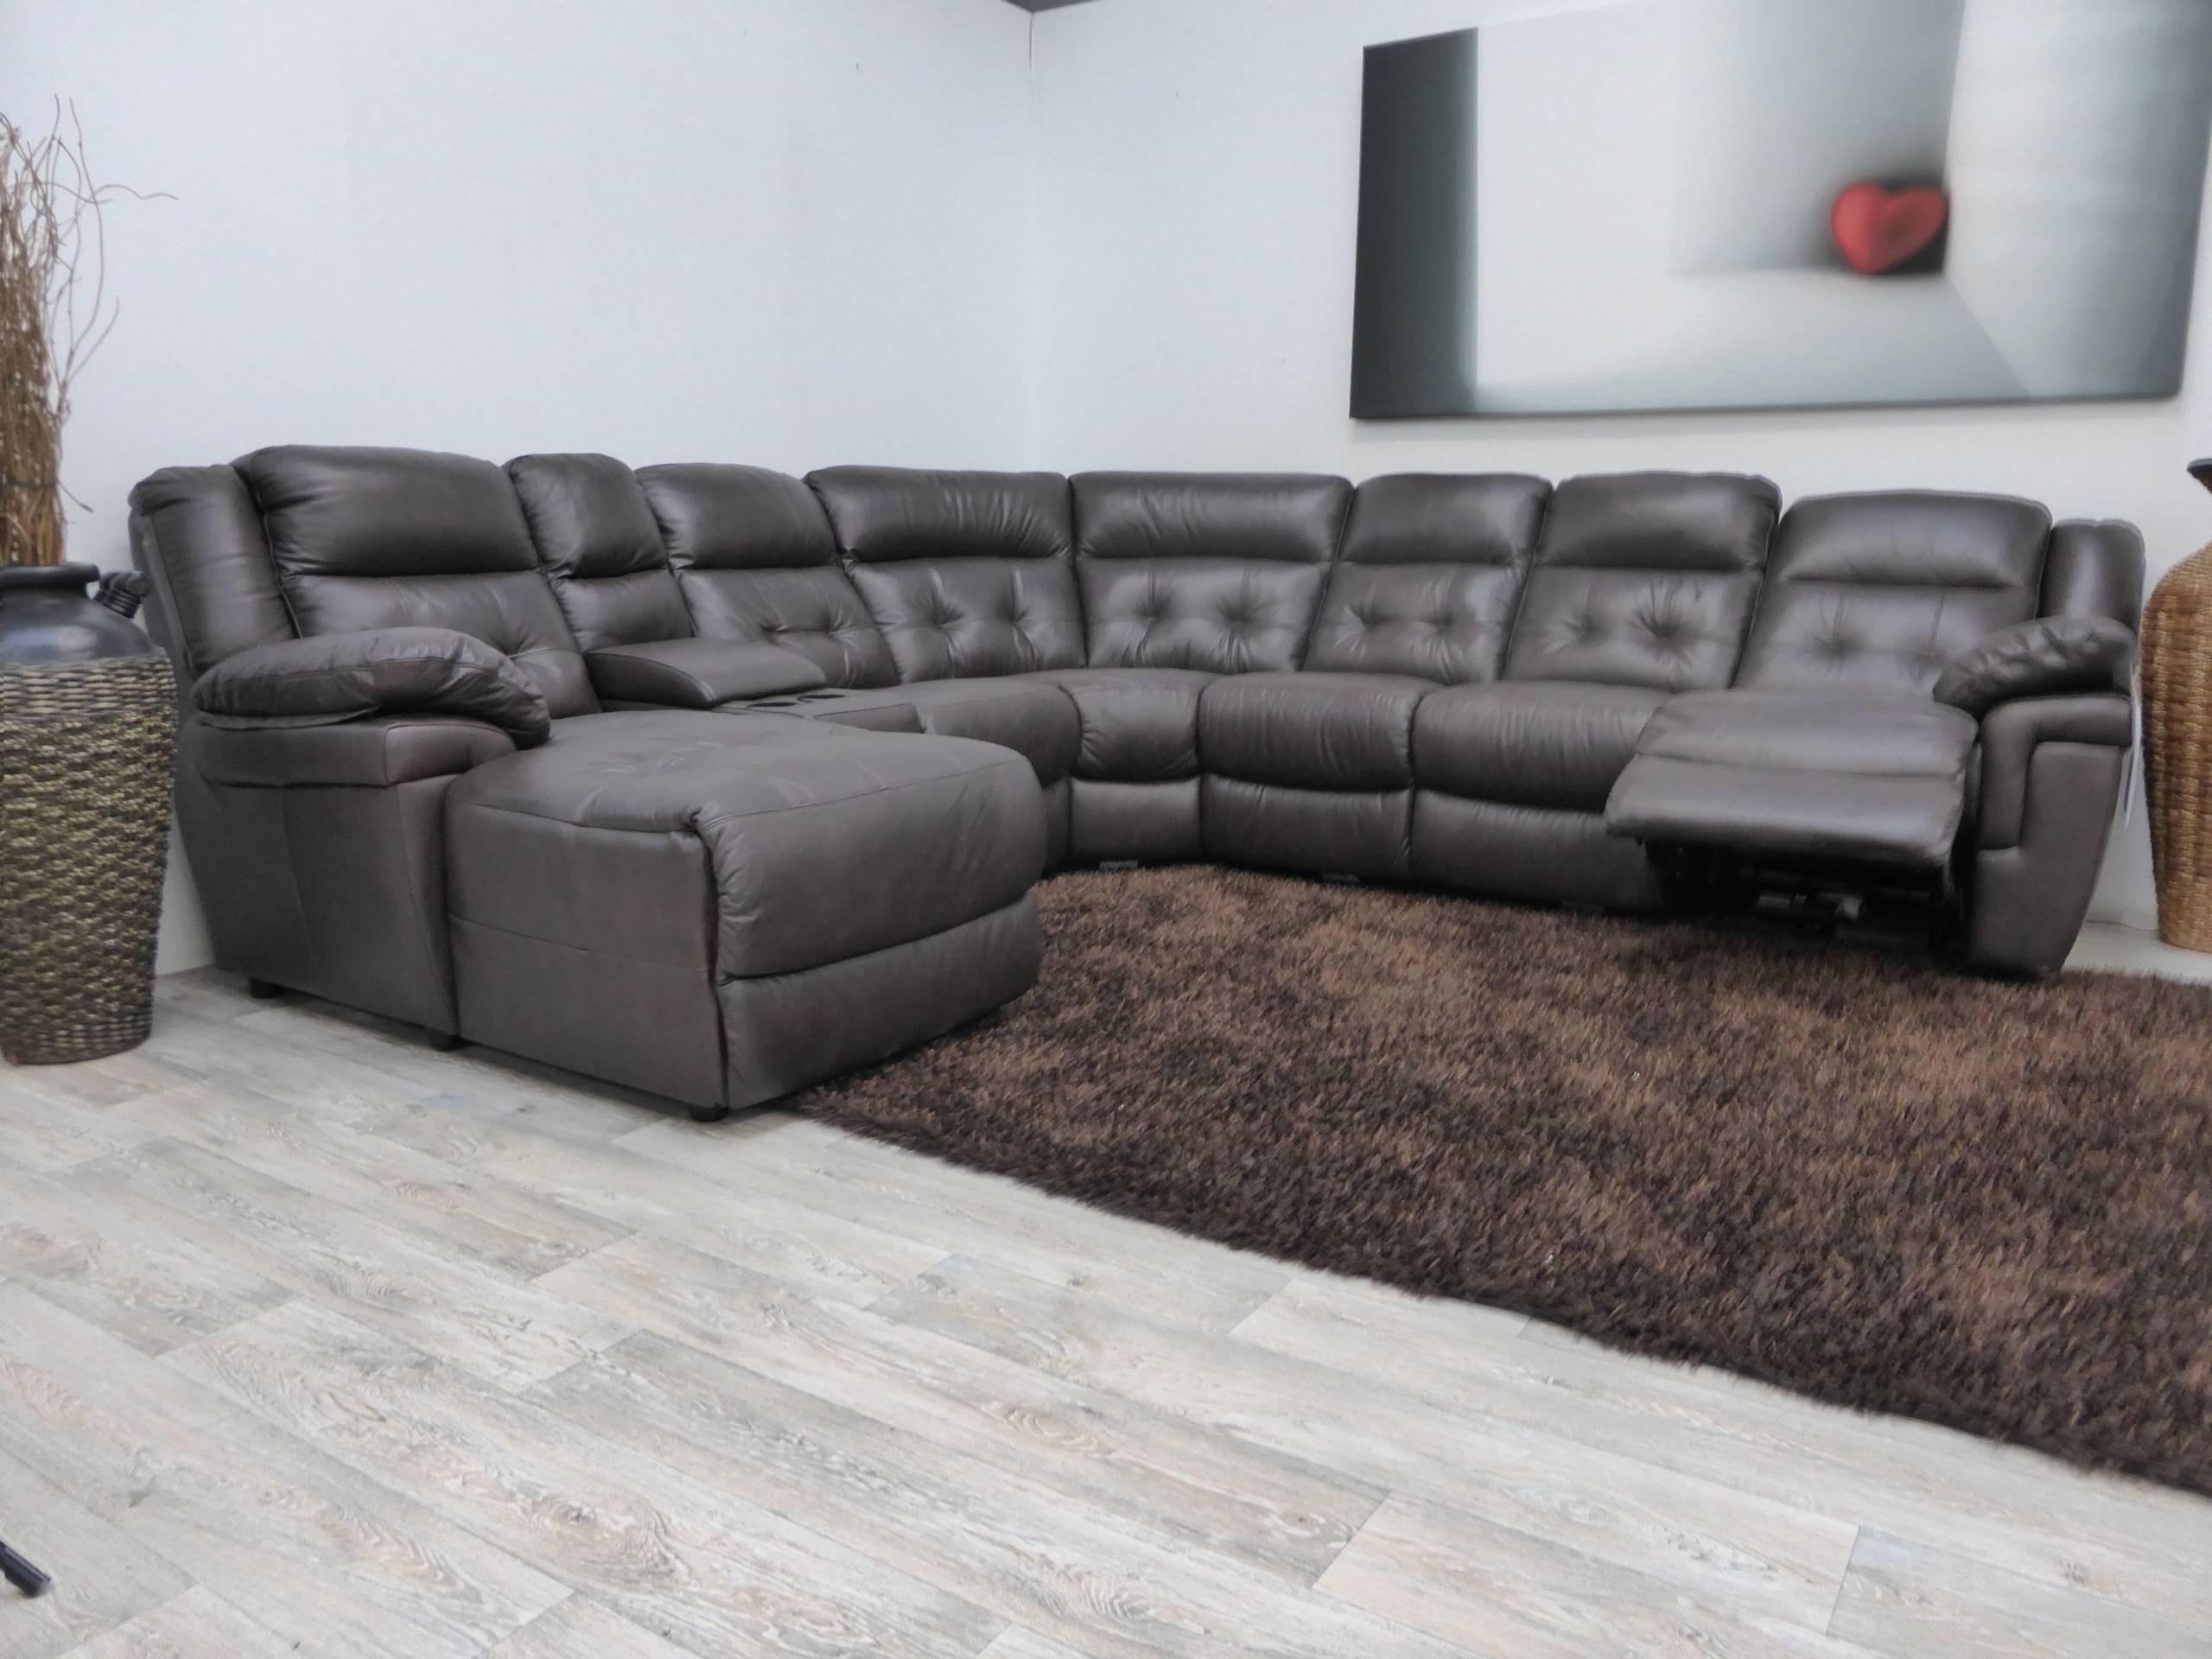 Current Craigslist Leather Sofa – Mforum Intended For Craigslist Leather Sofas (View 9 of 15)